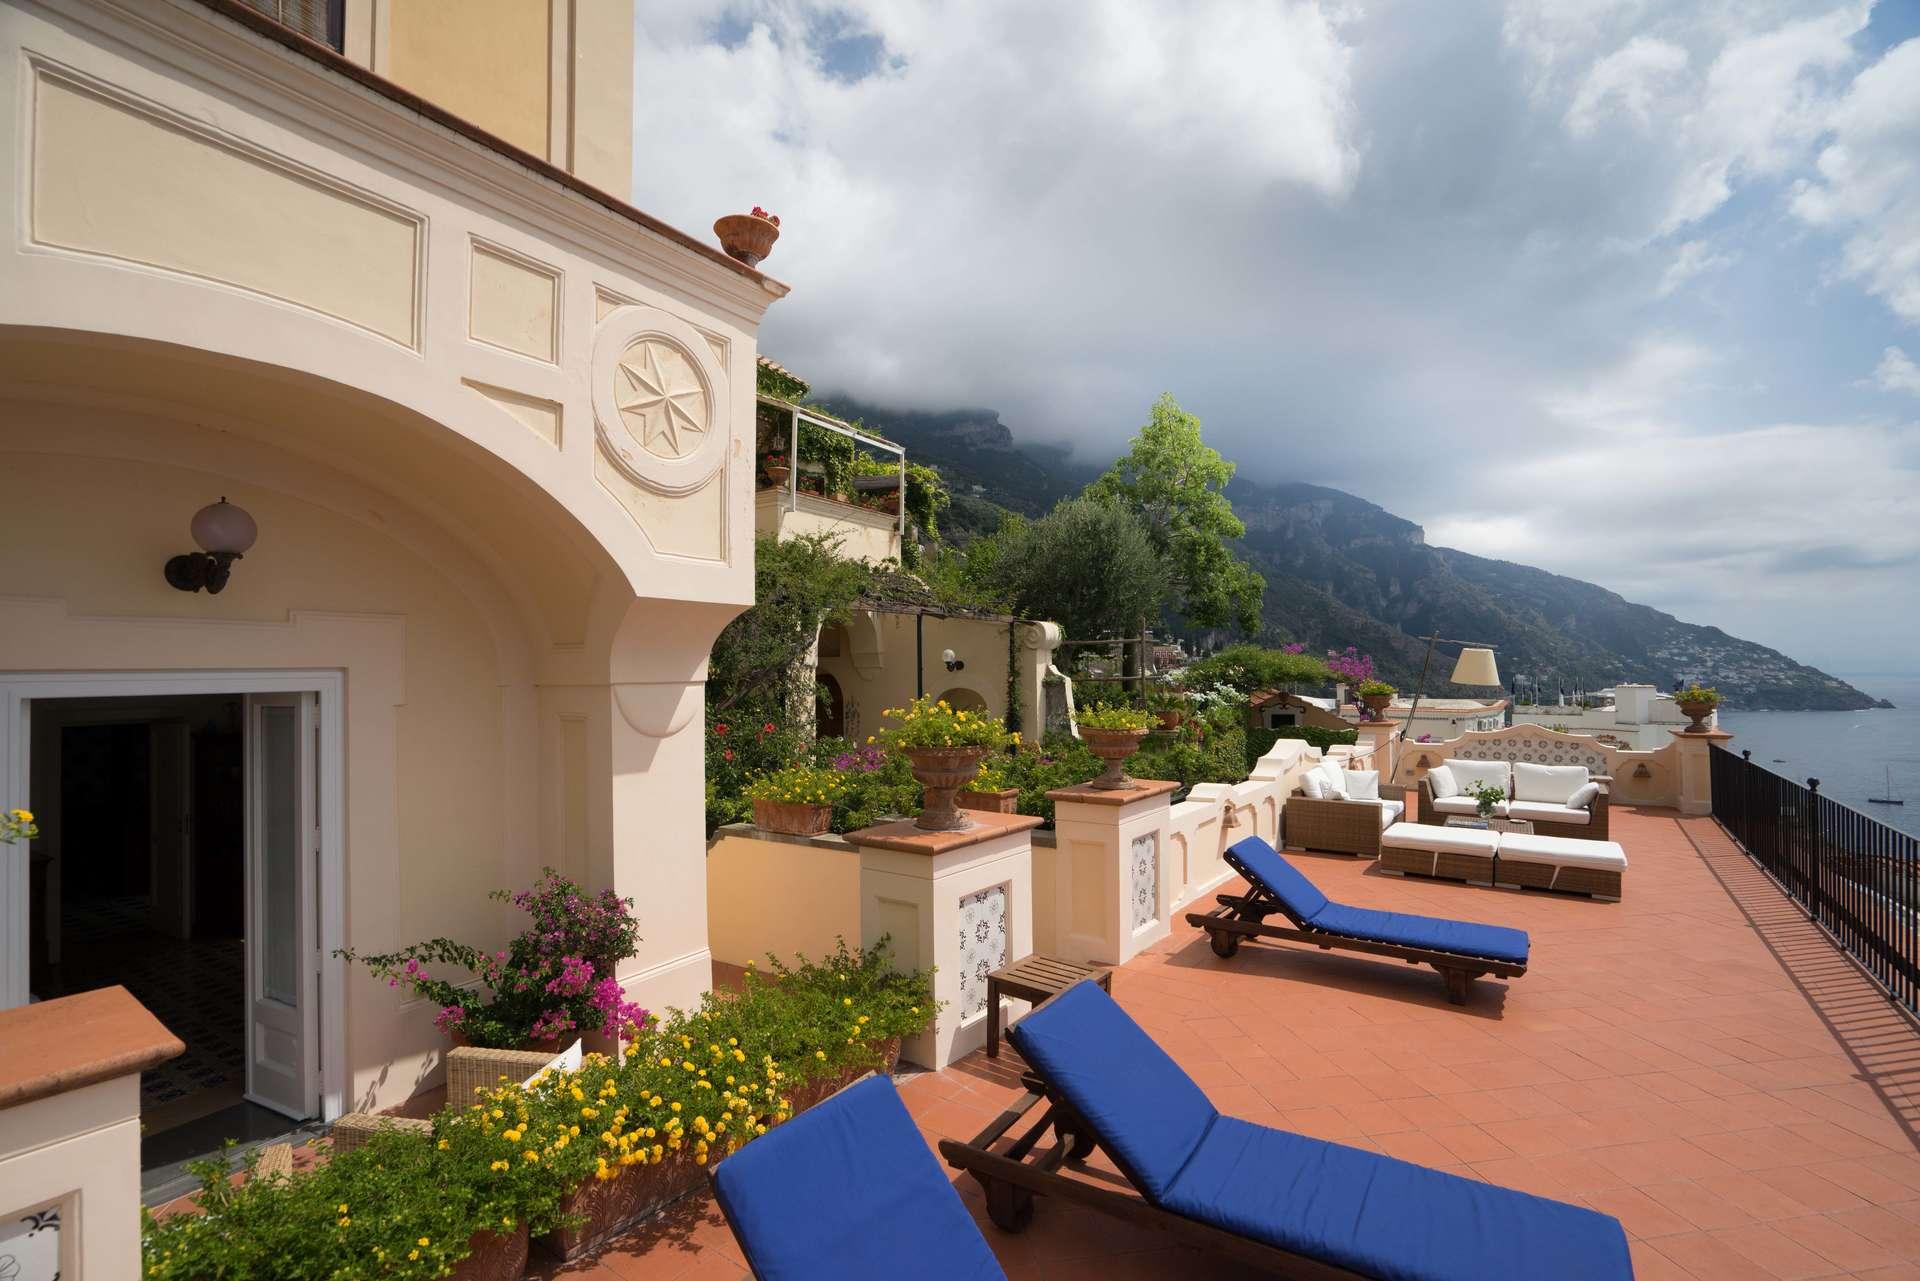 Luxury vacation rentals europe - Italy - Amalfi coast - Po sitano - Casa Ninfa - Image 1/27